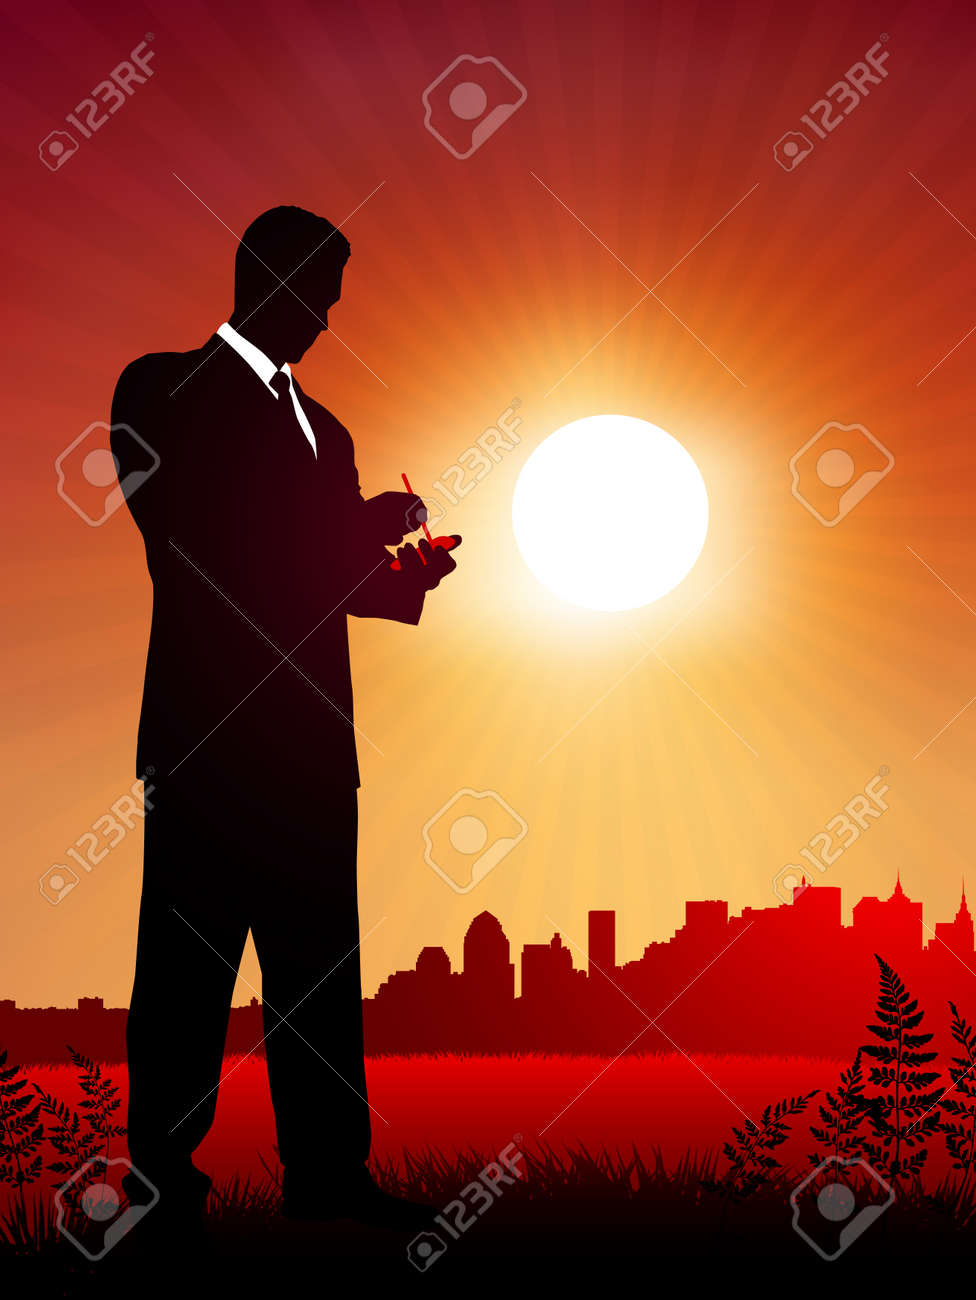 businessman at work on sunset backgroundOriginal Vector IllustrationBusiness People on Sunset Background Stock Vector - 22431258